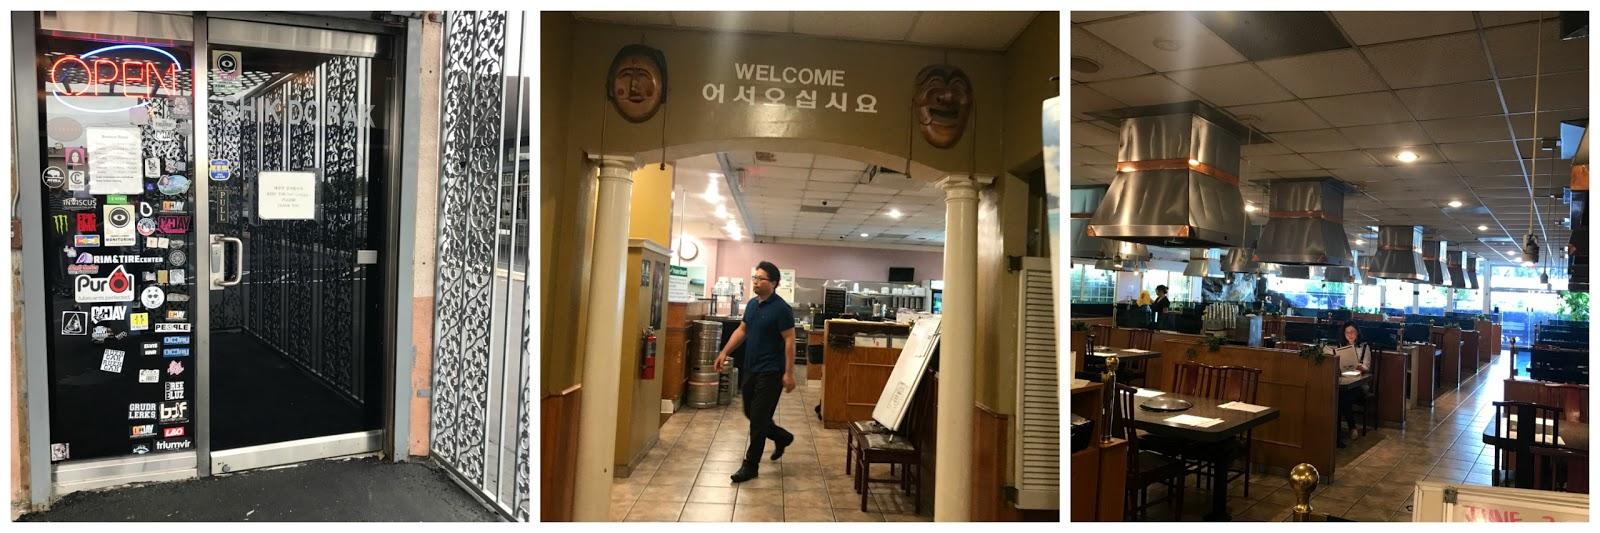 ChicSassyMomEats | Korean BBQ Buffet at Shik Do Rak